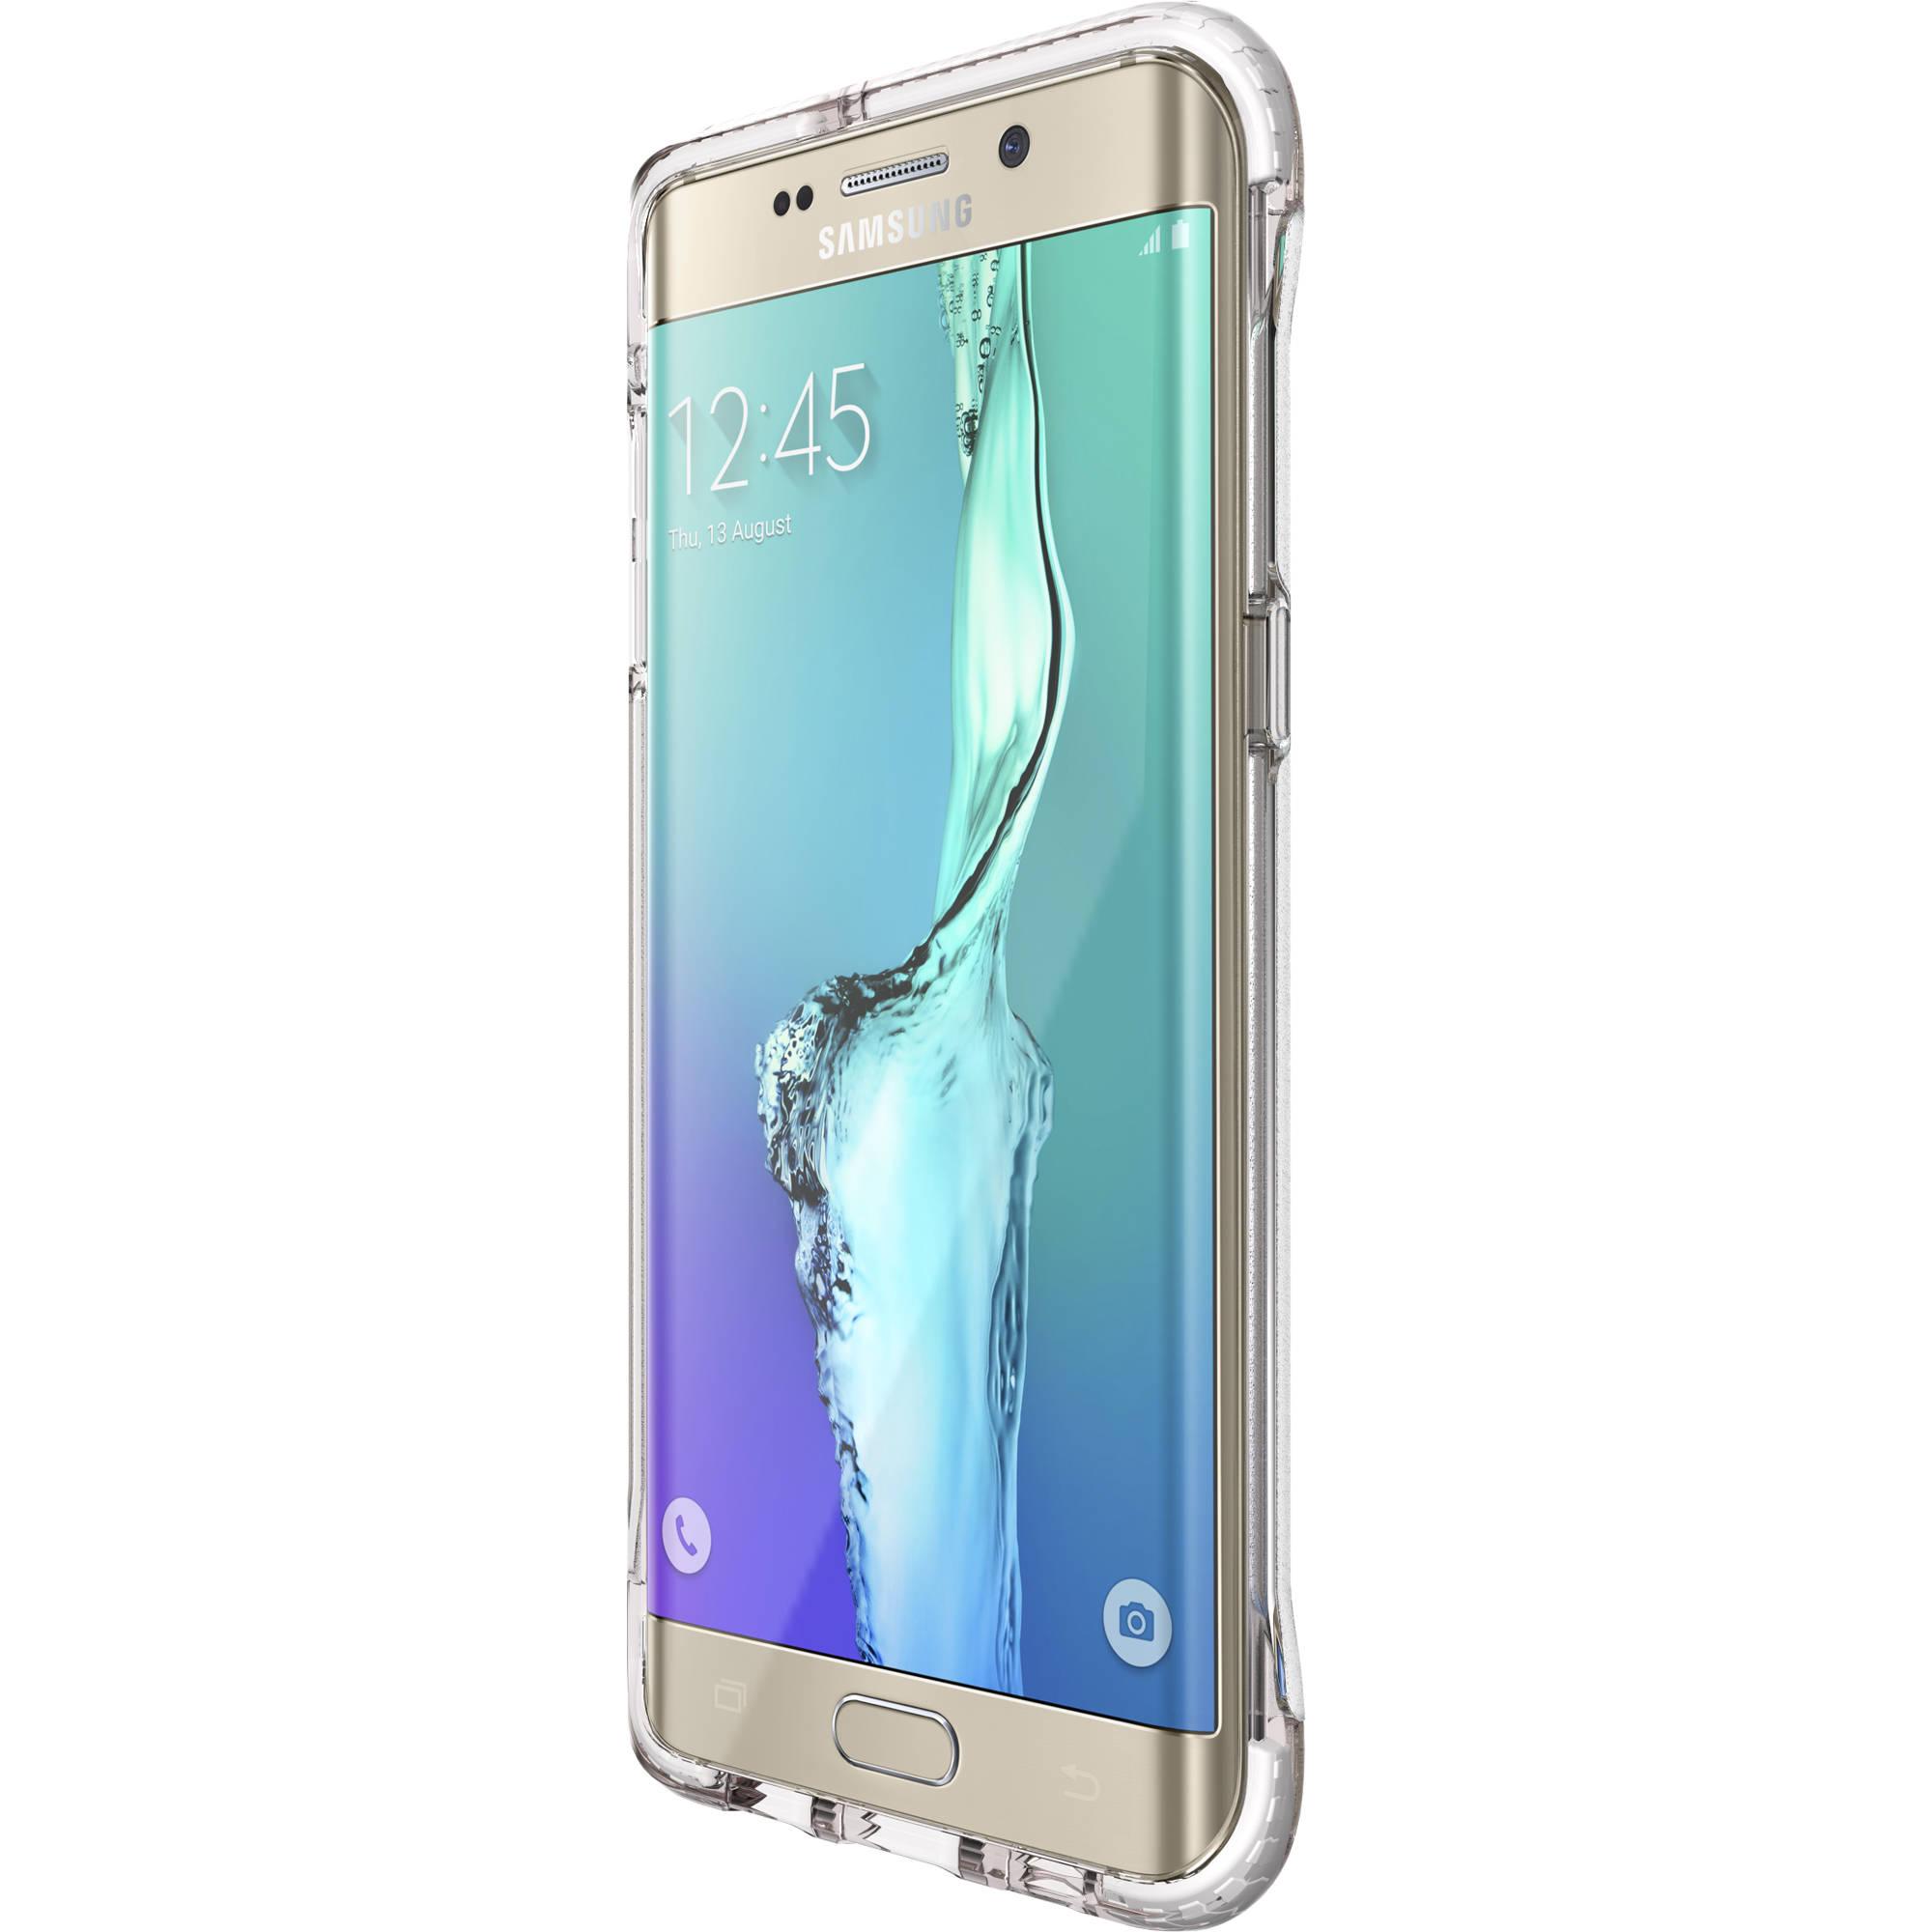 detailing 55db0 fe74a Tech21 Evo Frame Case for Galaxy S6 edge+ (Clear/White) T21-4486